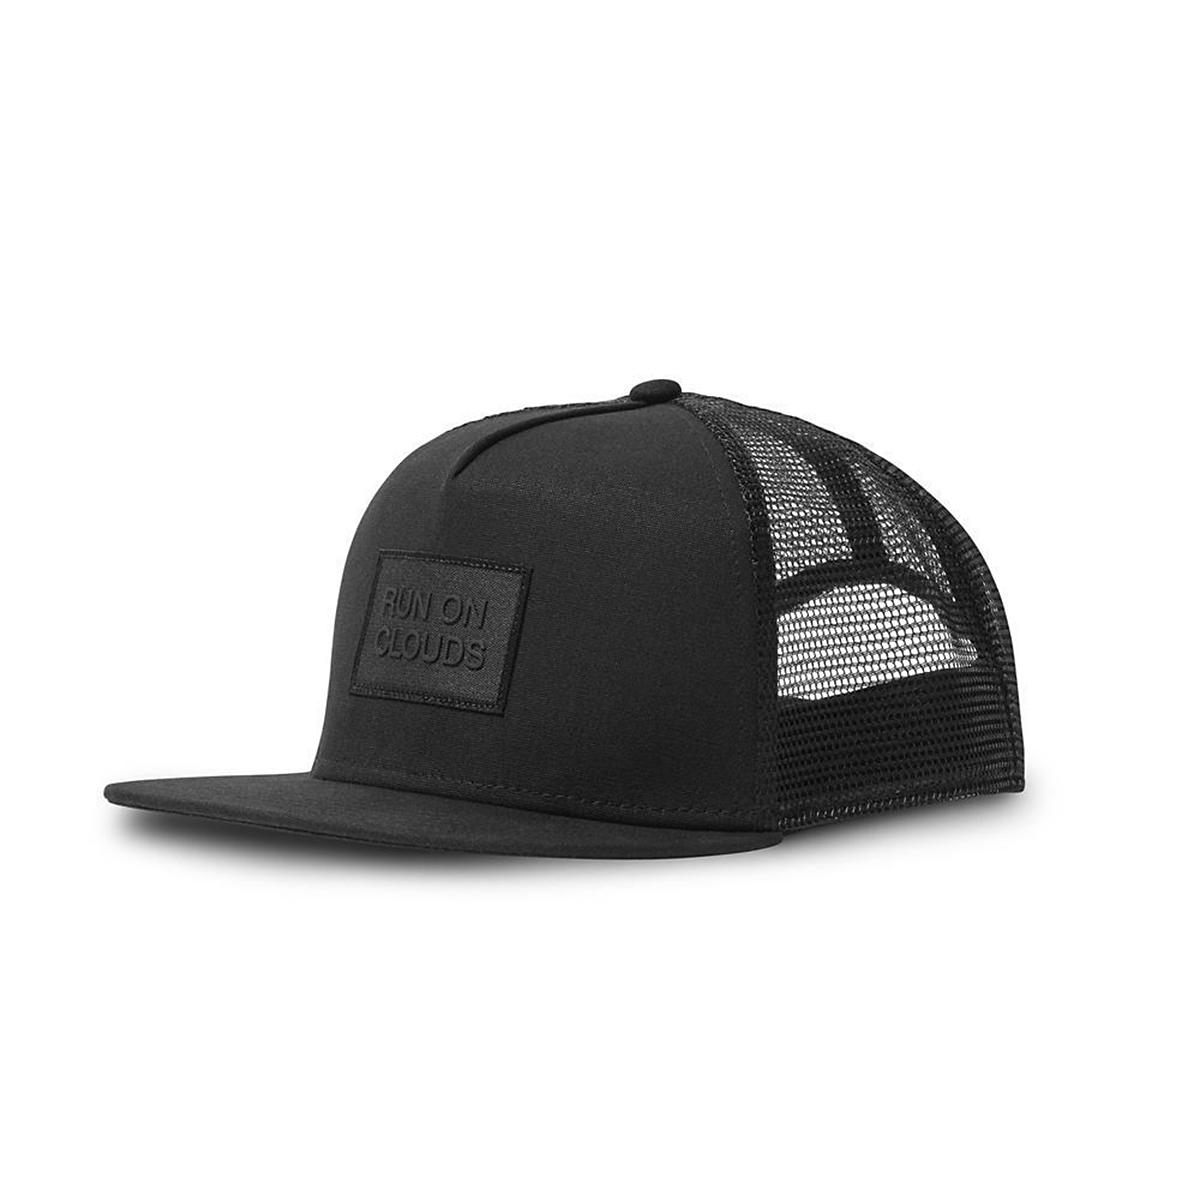 On Crew Cap - Color: Black, Black, large, image 1